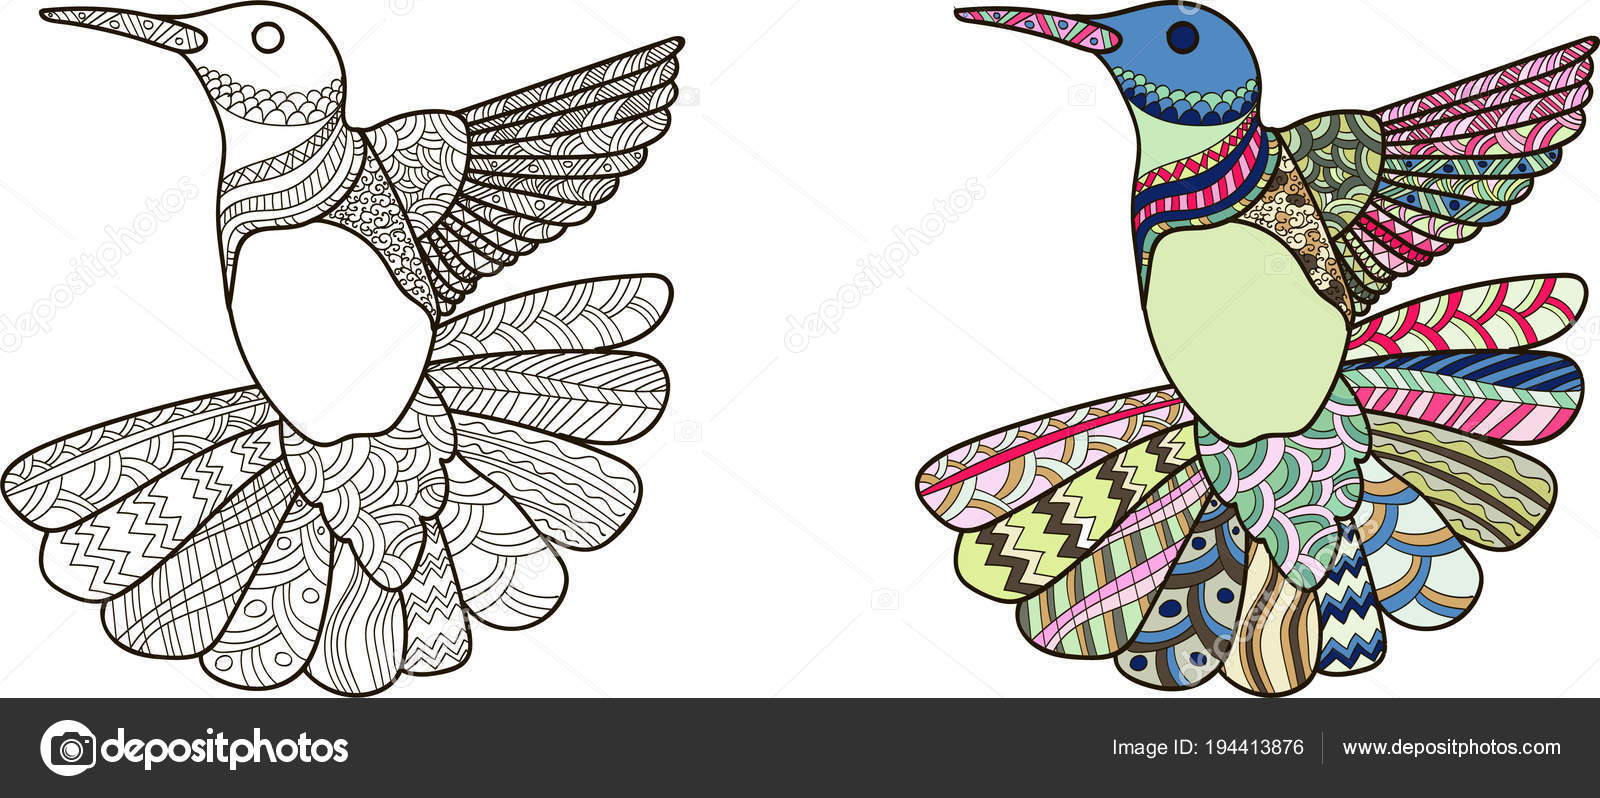 Dibujo Estilo Zentangle Colibrí Para Colorear Libro Tatuaje Diseño ...